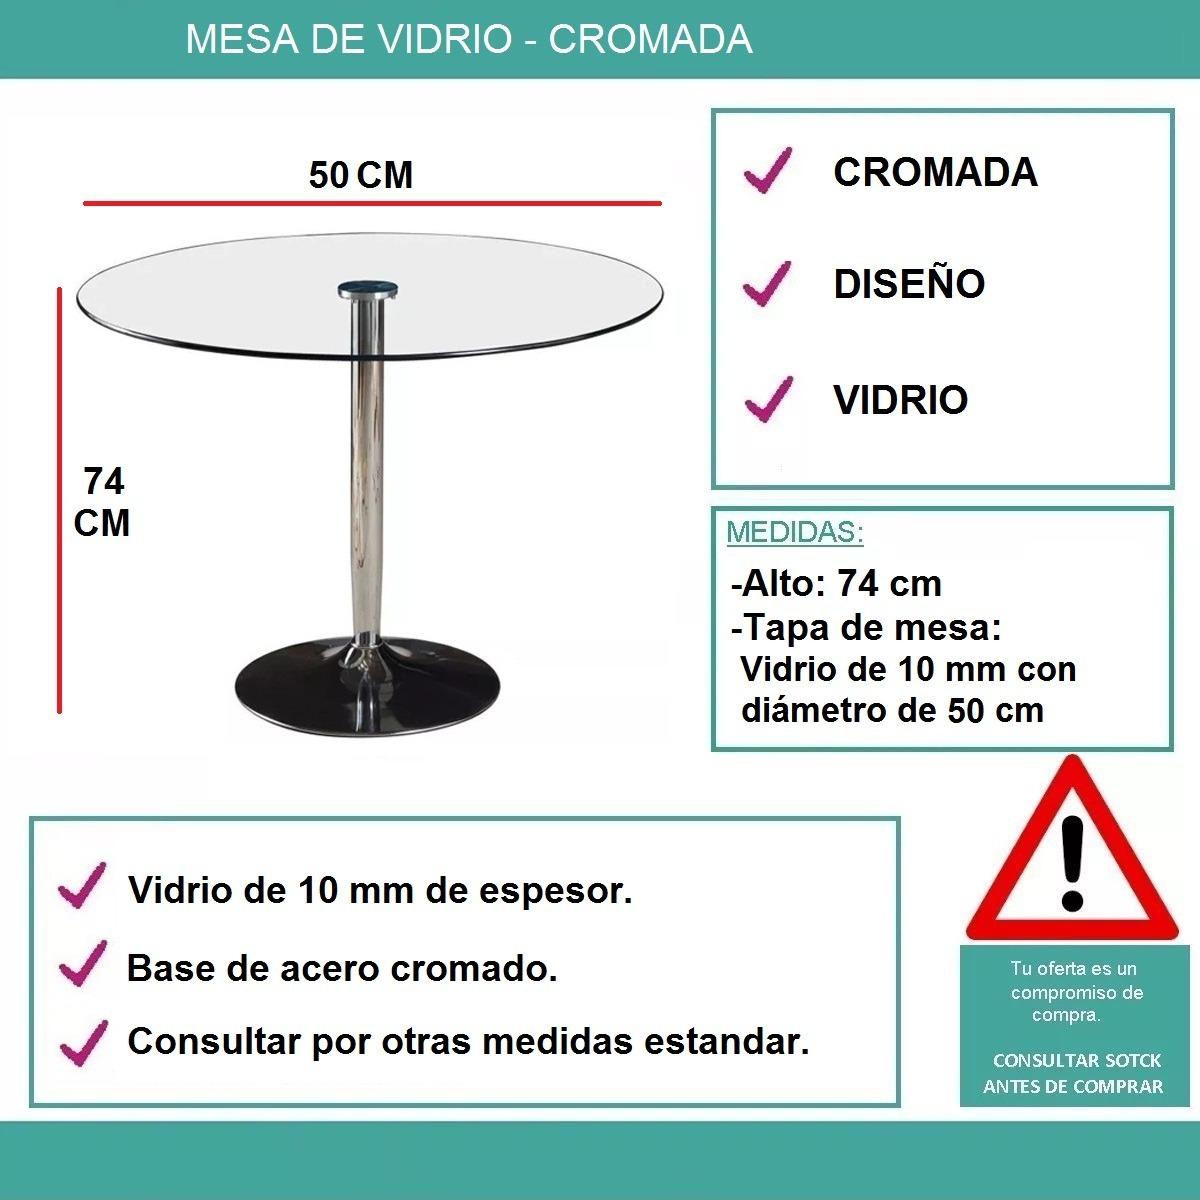 Mesa Cromada De Vidrio P/ Cocina Comedor Diámetro De 50 Cm